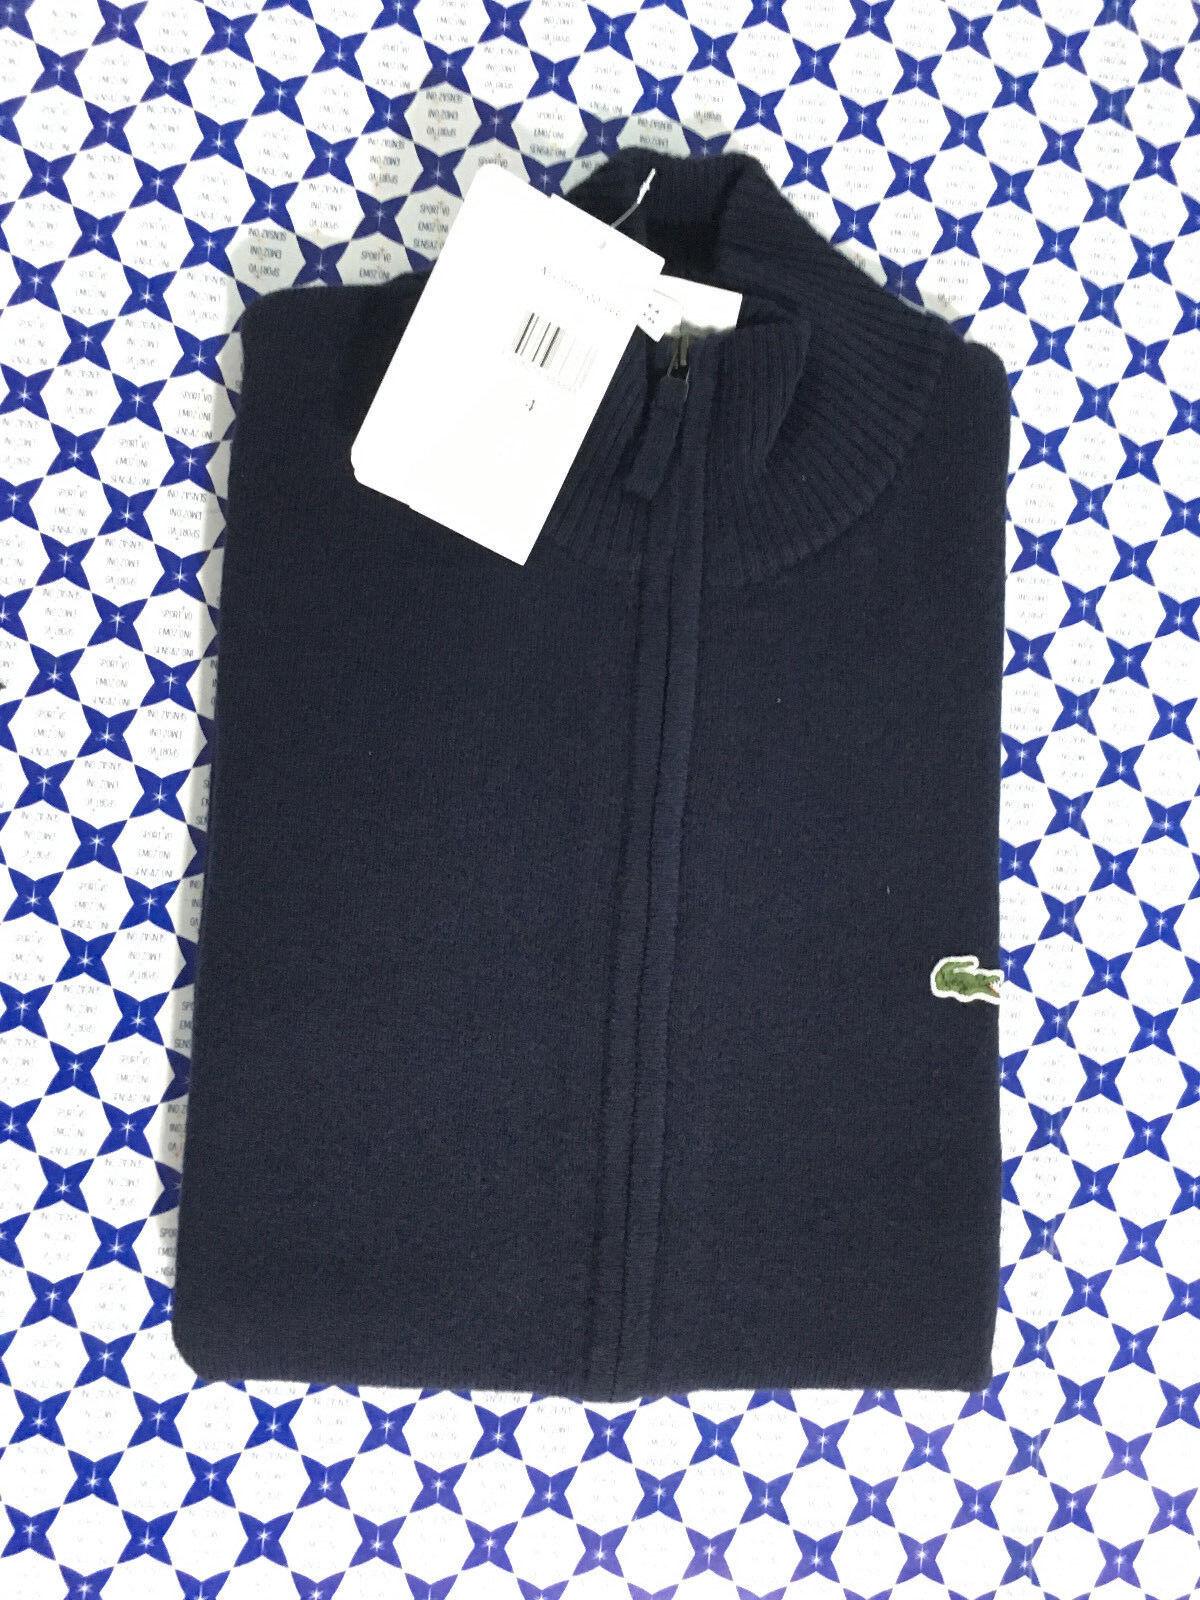 Cardigan Lacoste Uomo - Lana Cerniera Pure Pure Pure New Wool - Blu Navy - AH2999 682396